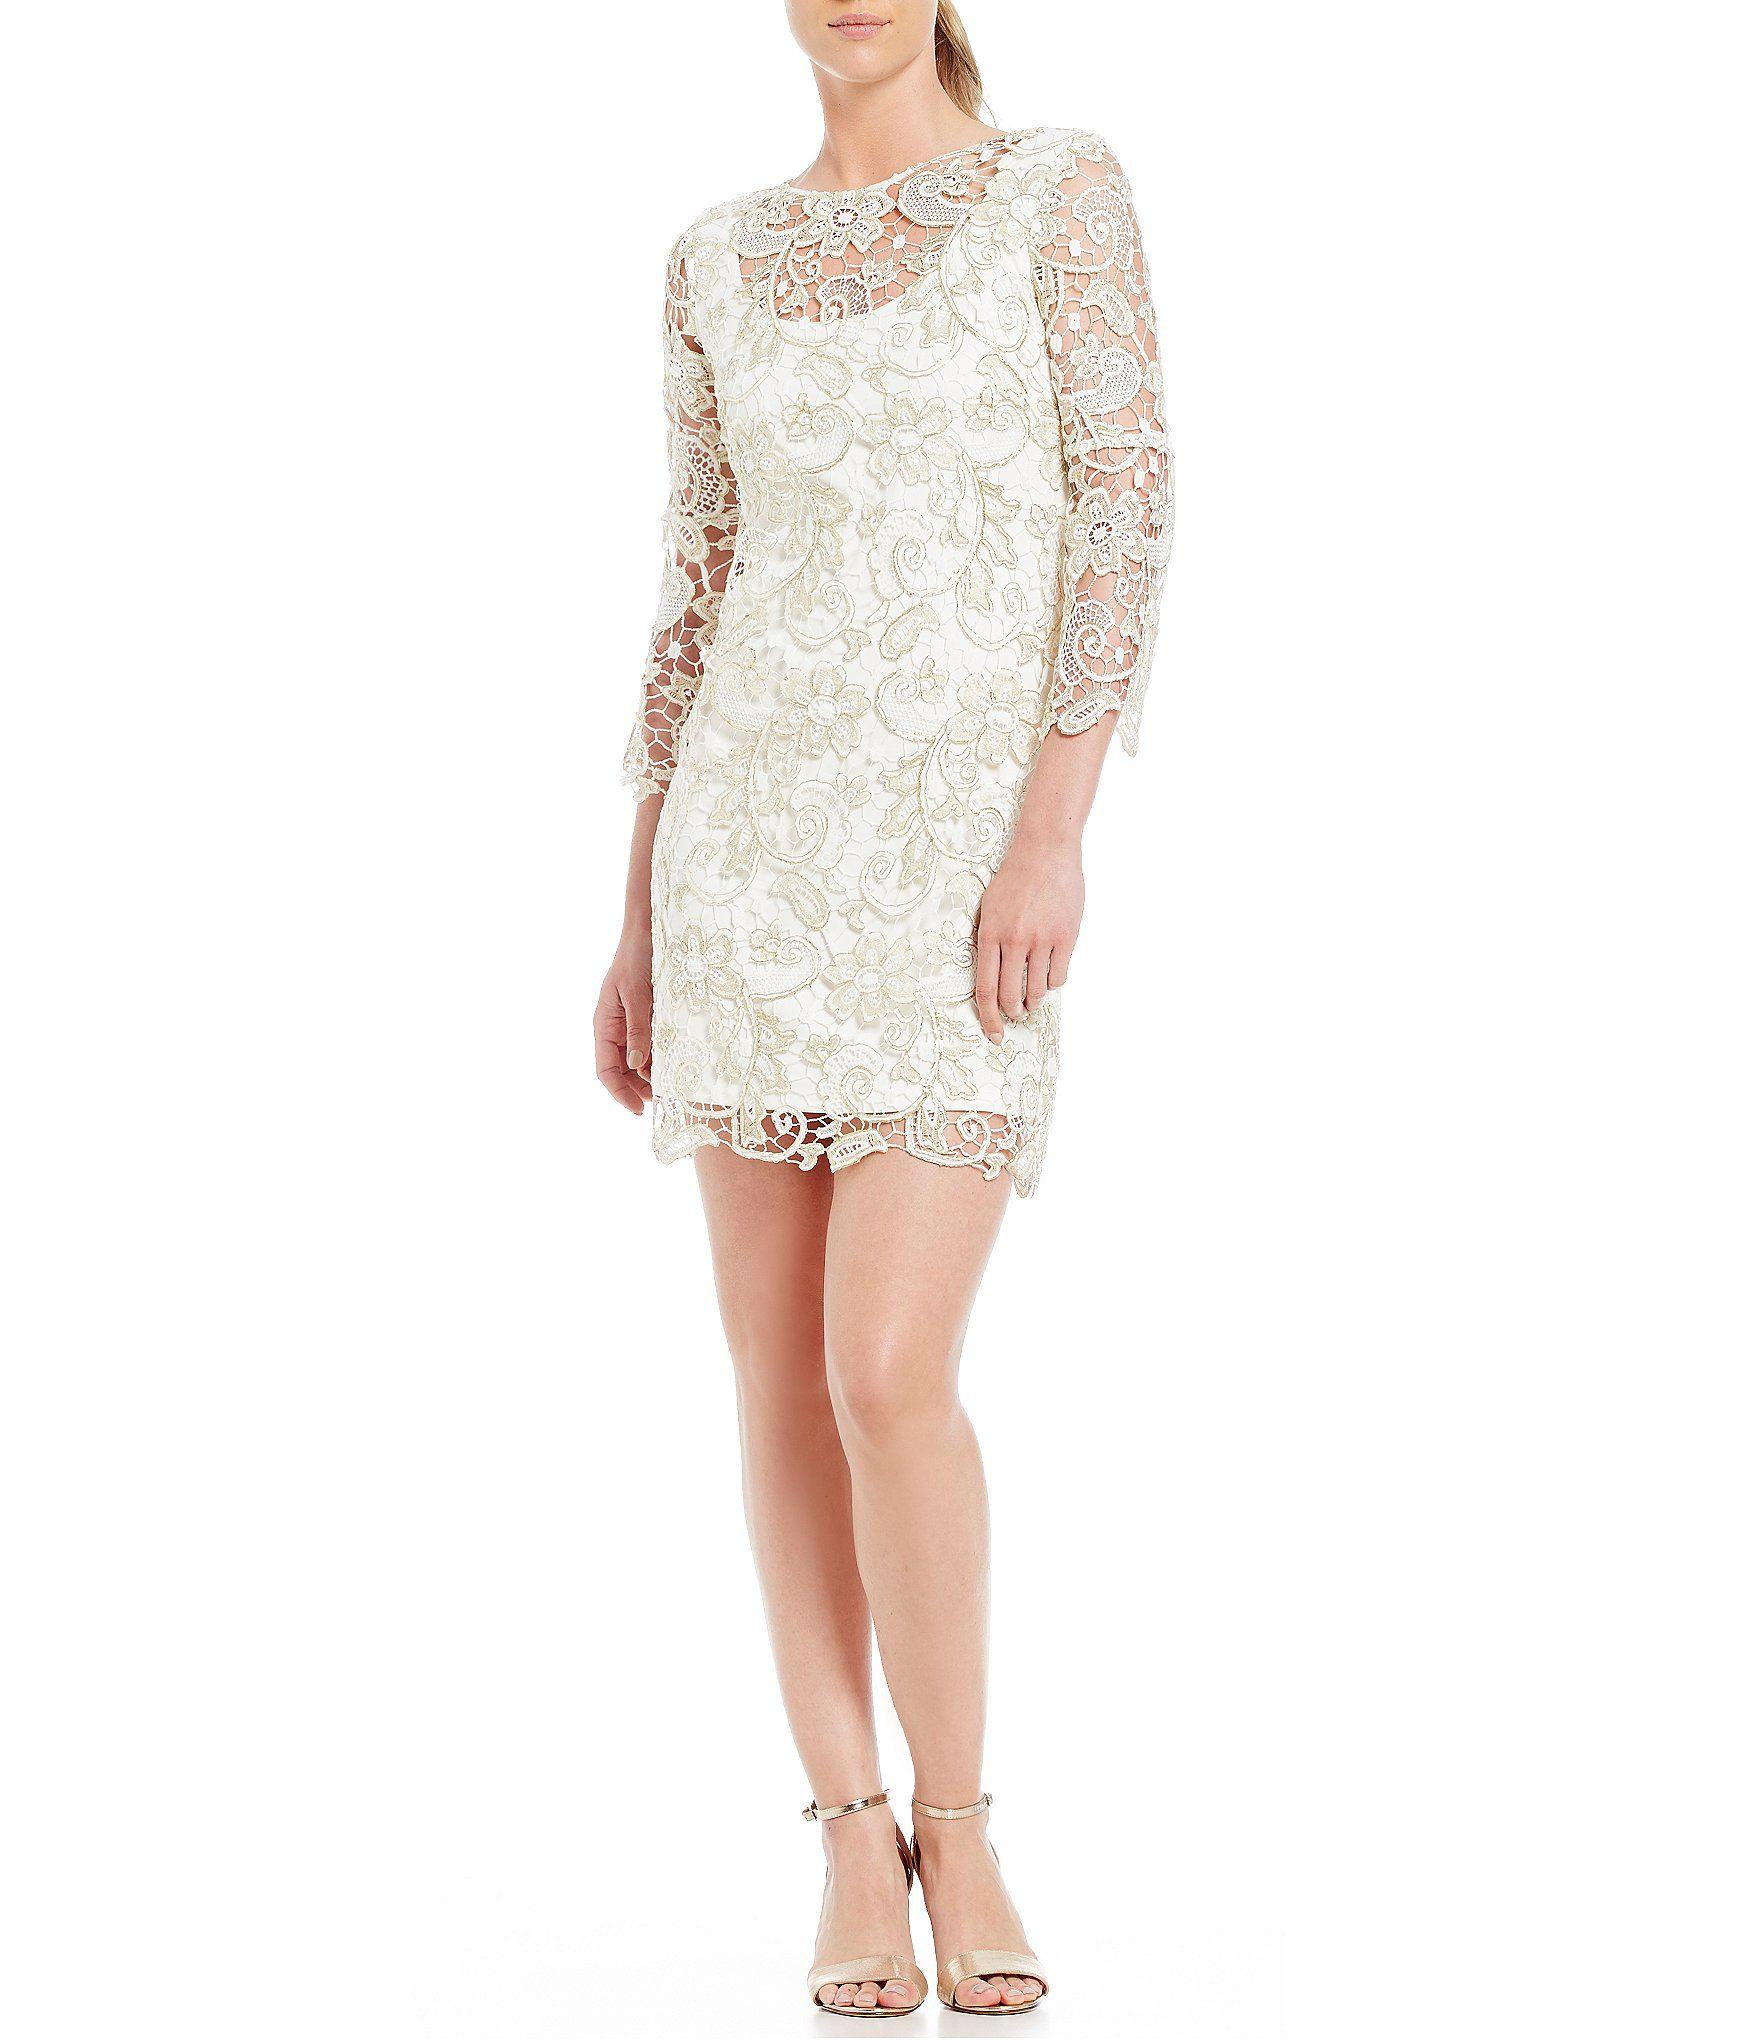 Marina Bellsleeve Metallic Lace Dress Dillards Dresses Metallic Cocktail Dresses Womens Cocktail Dresses